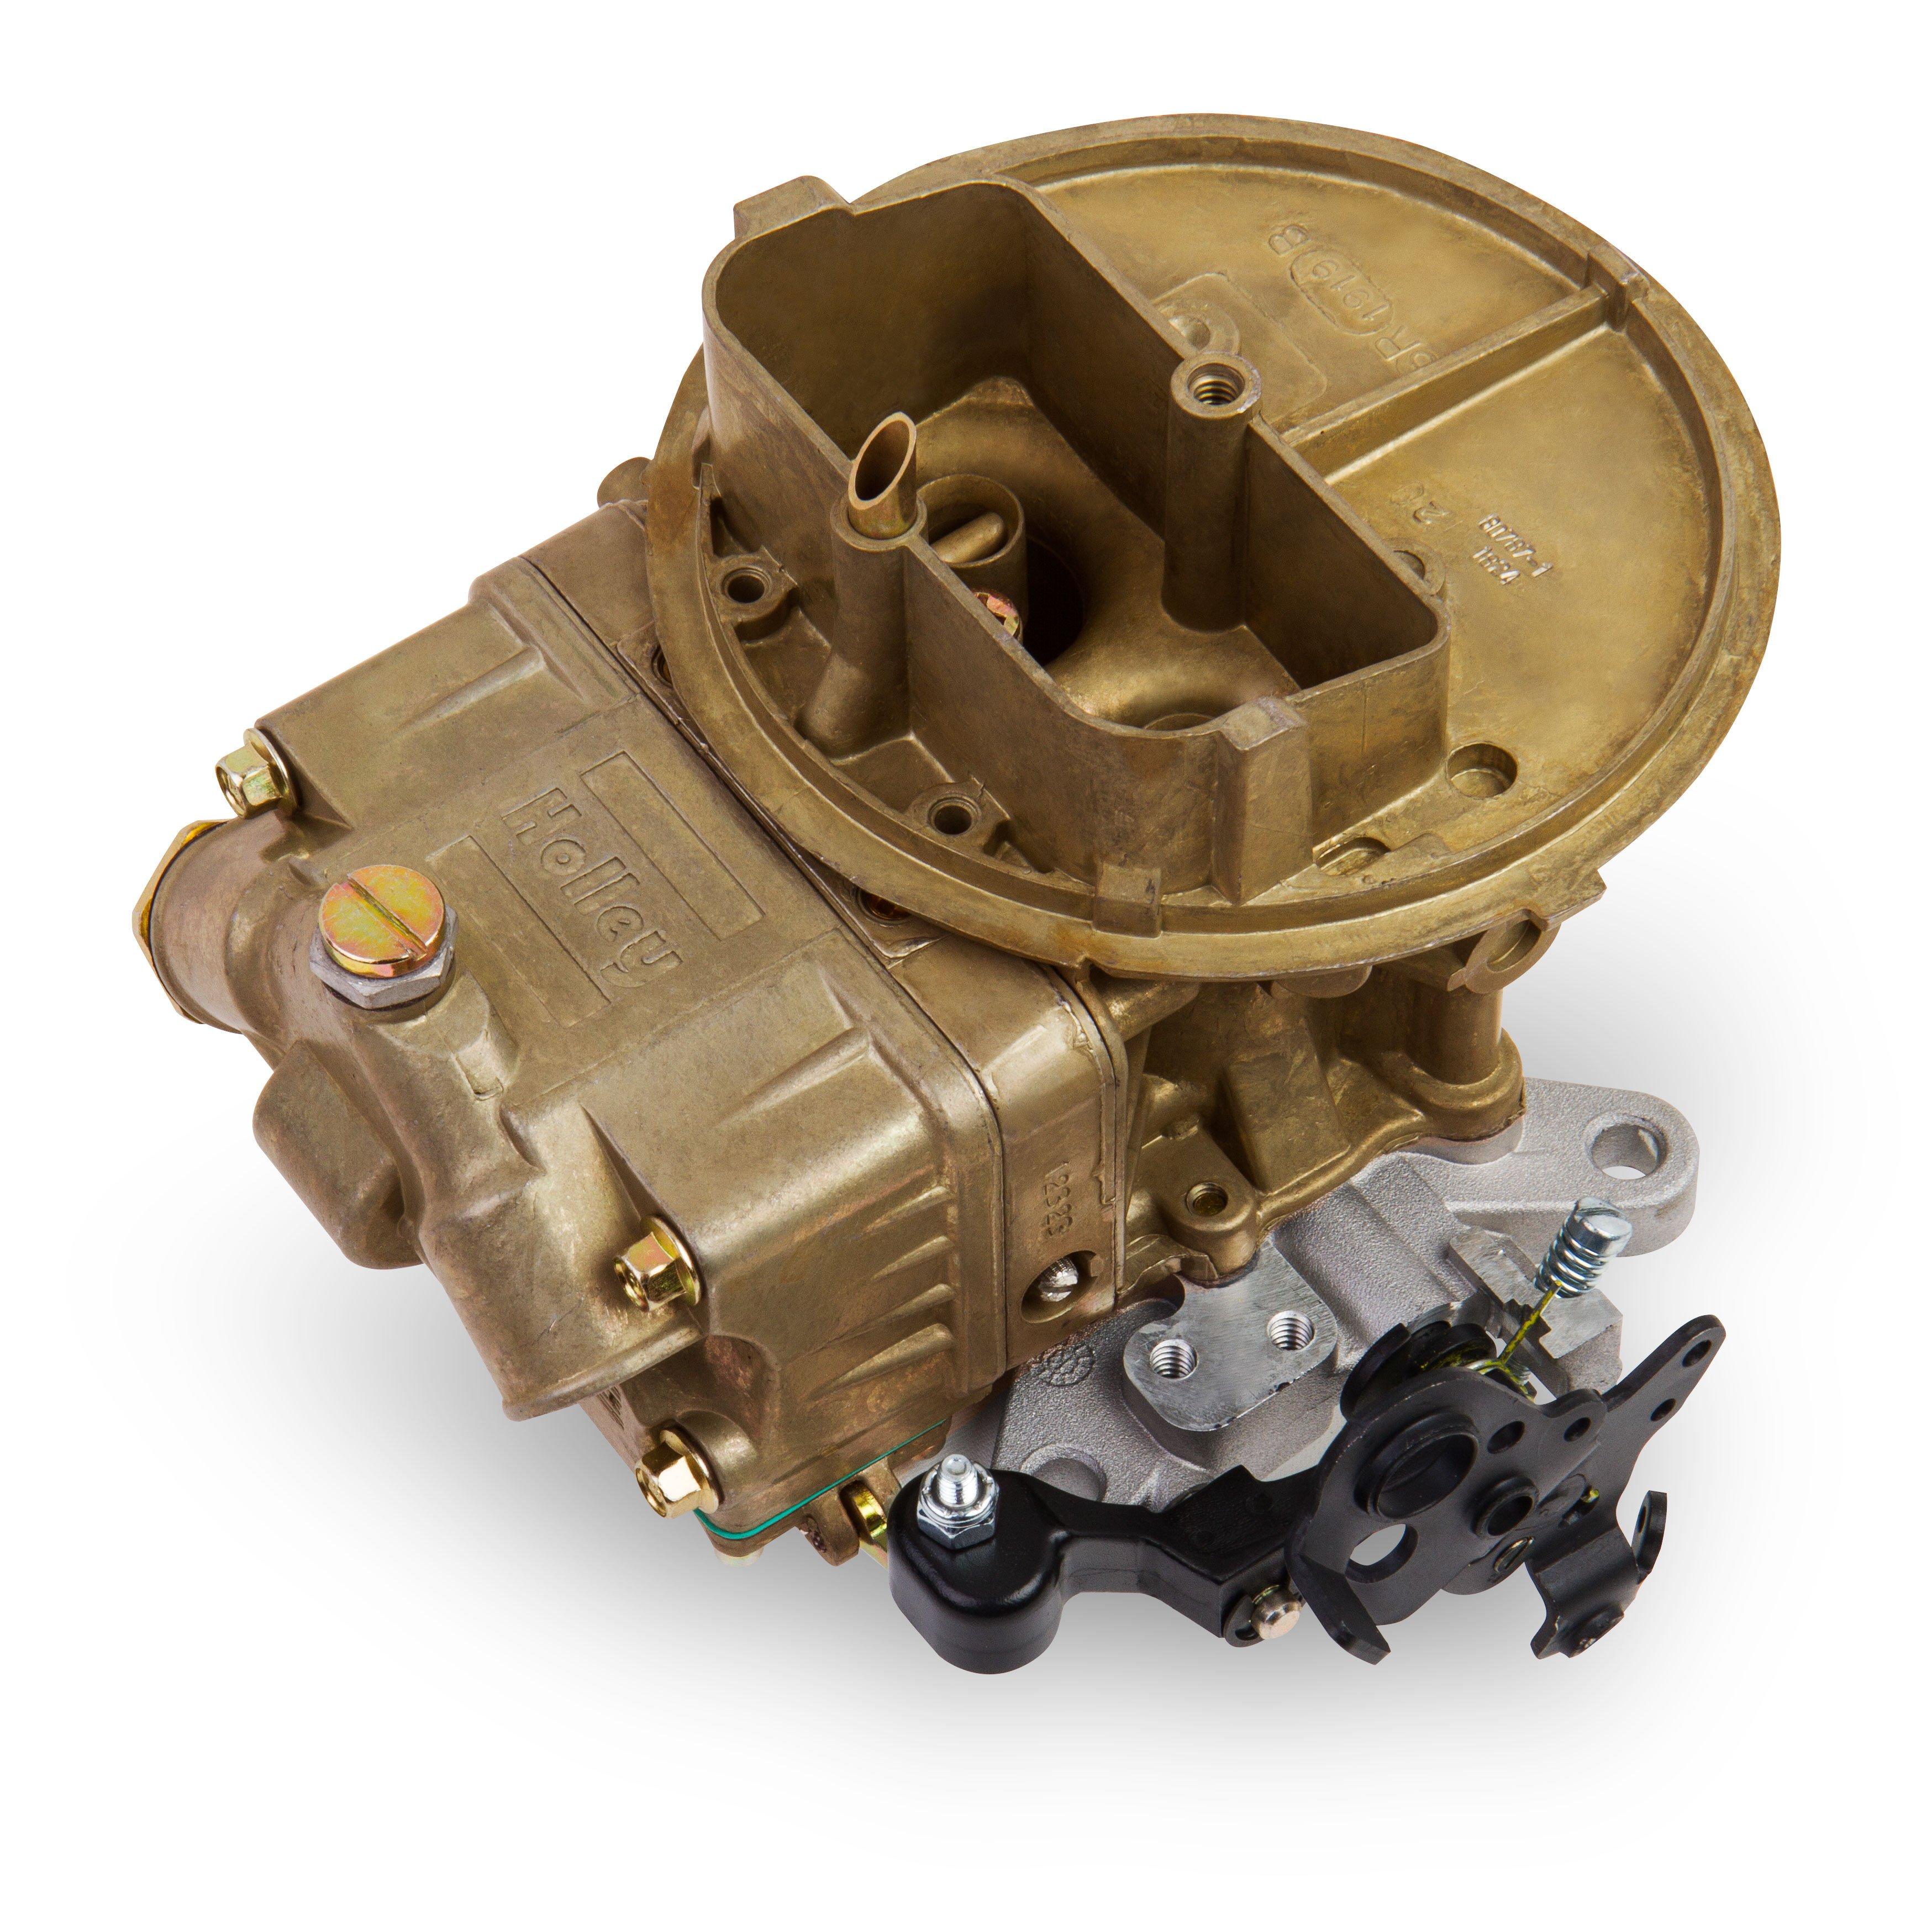 Holley Throttle Body Gasket List # 7448 Five Pack